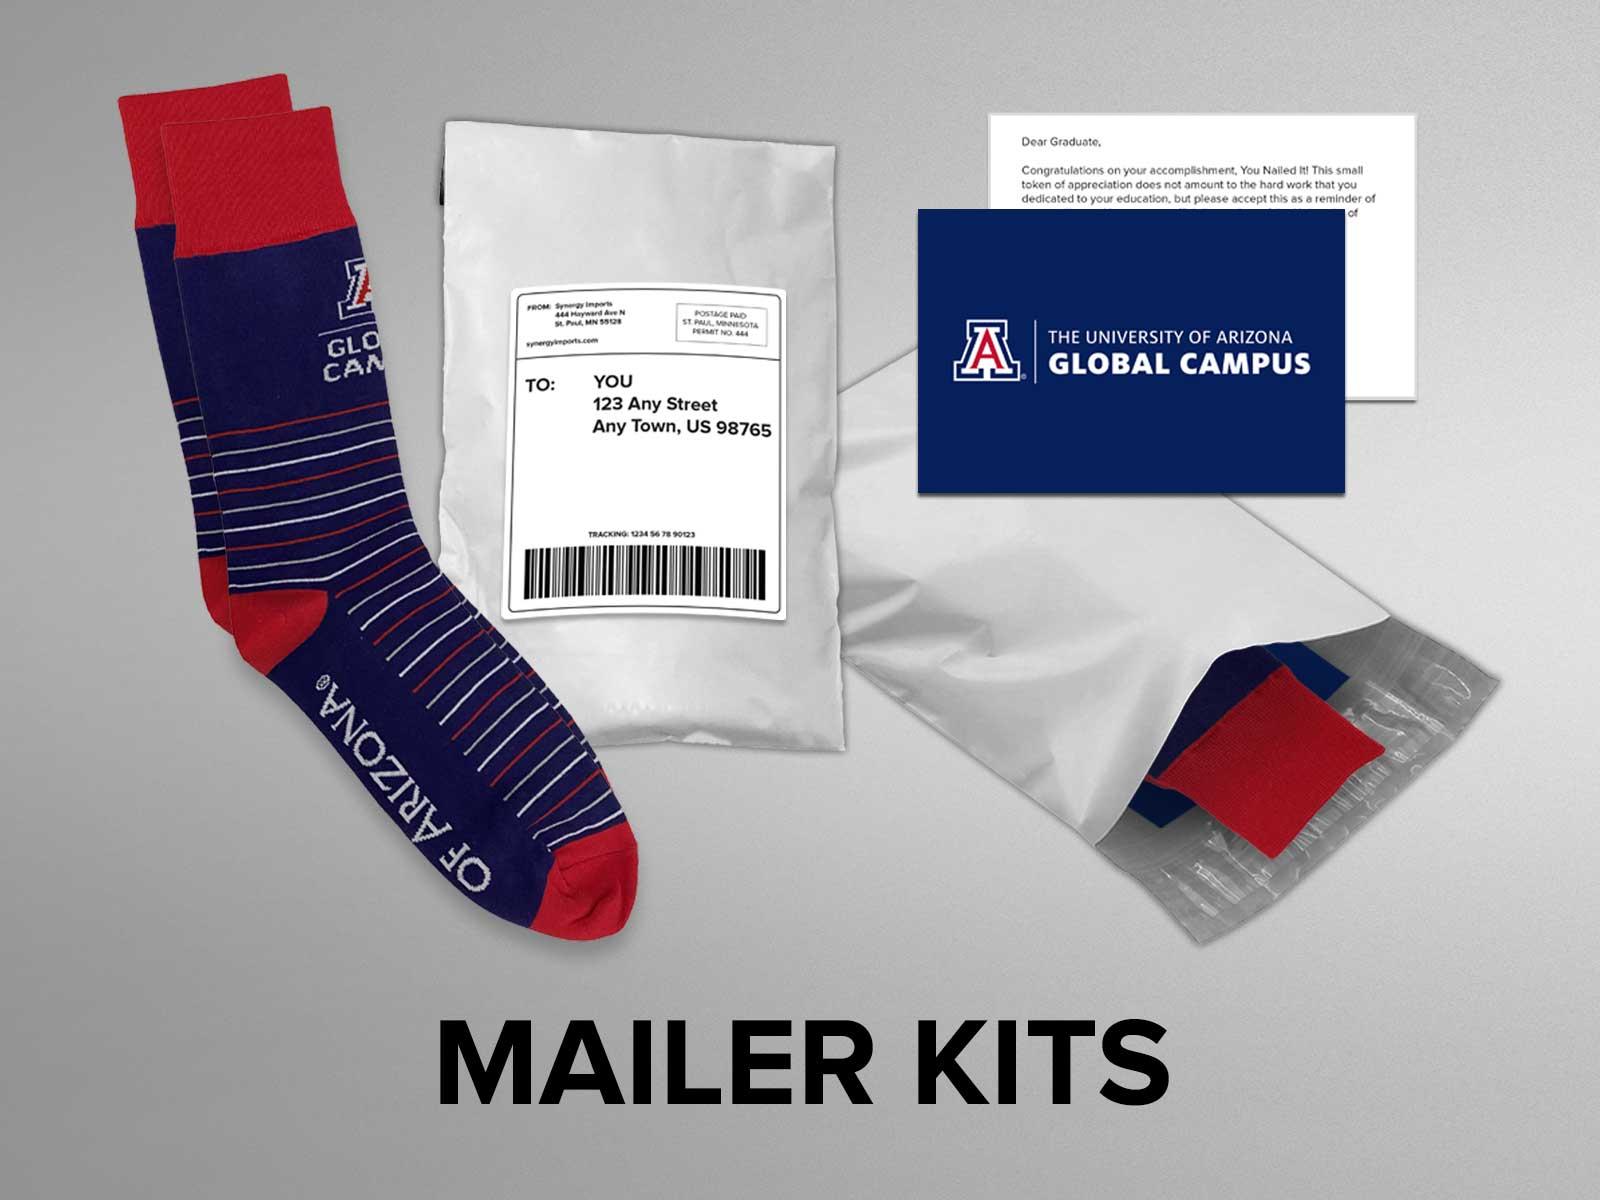 Mailer Kits